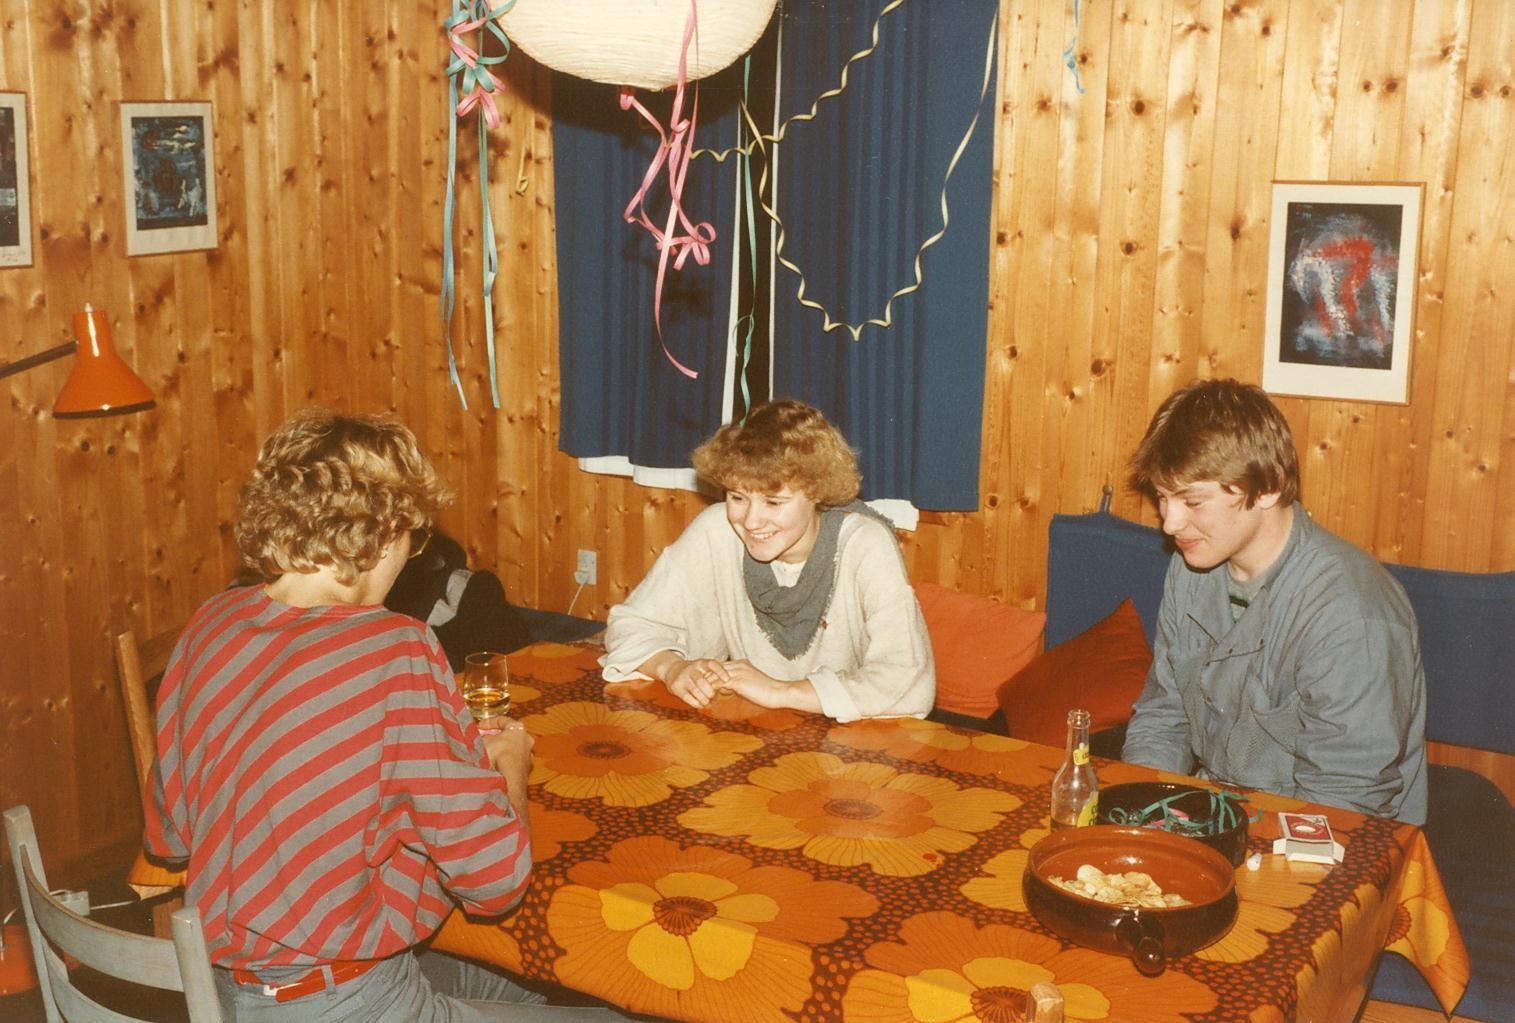 Scan11389 KÓRTKLUB 01-01-1984